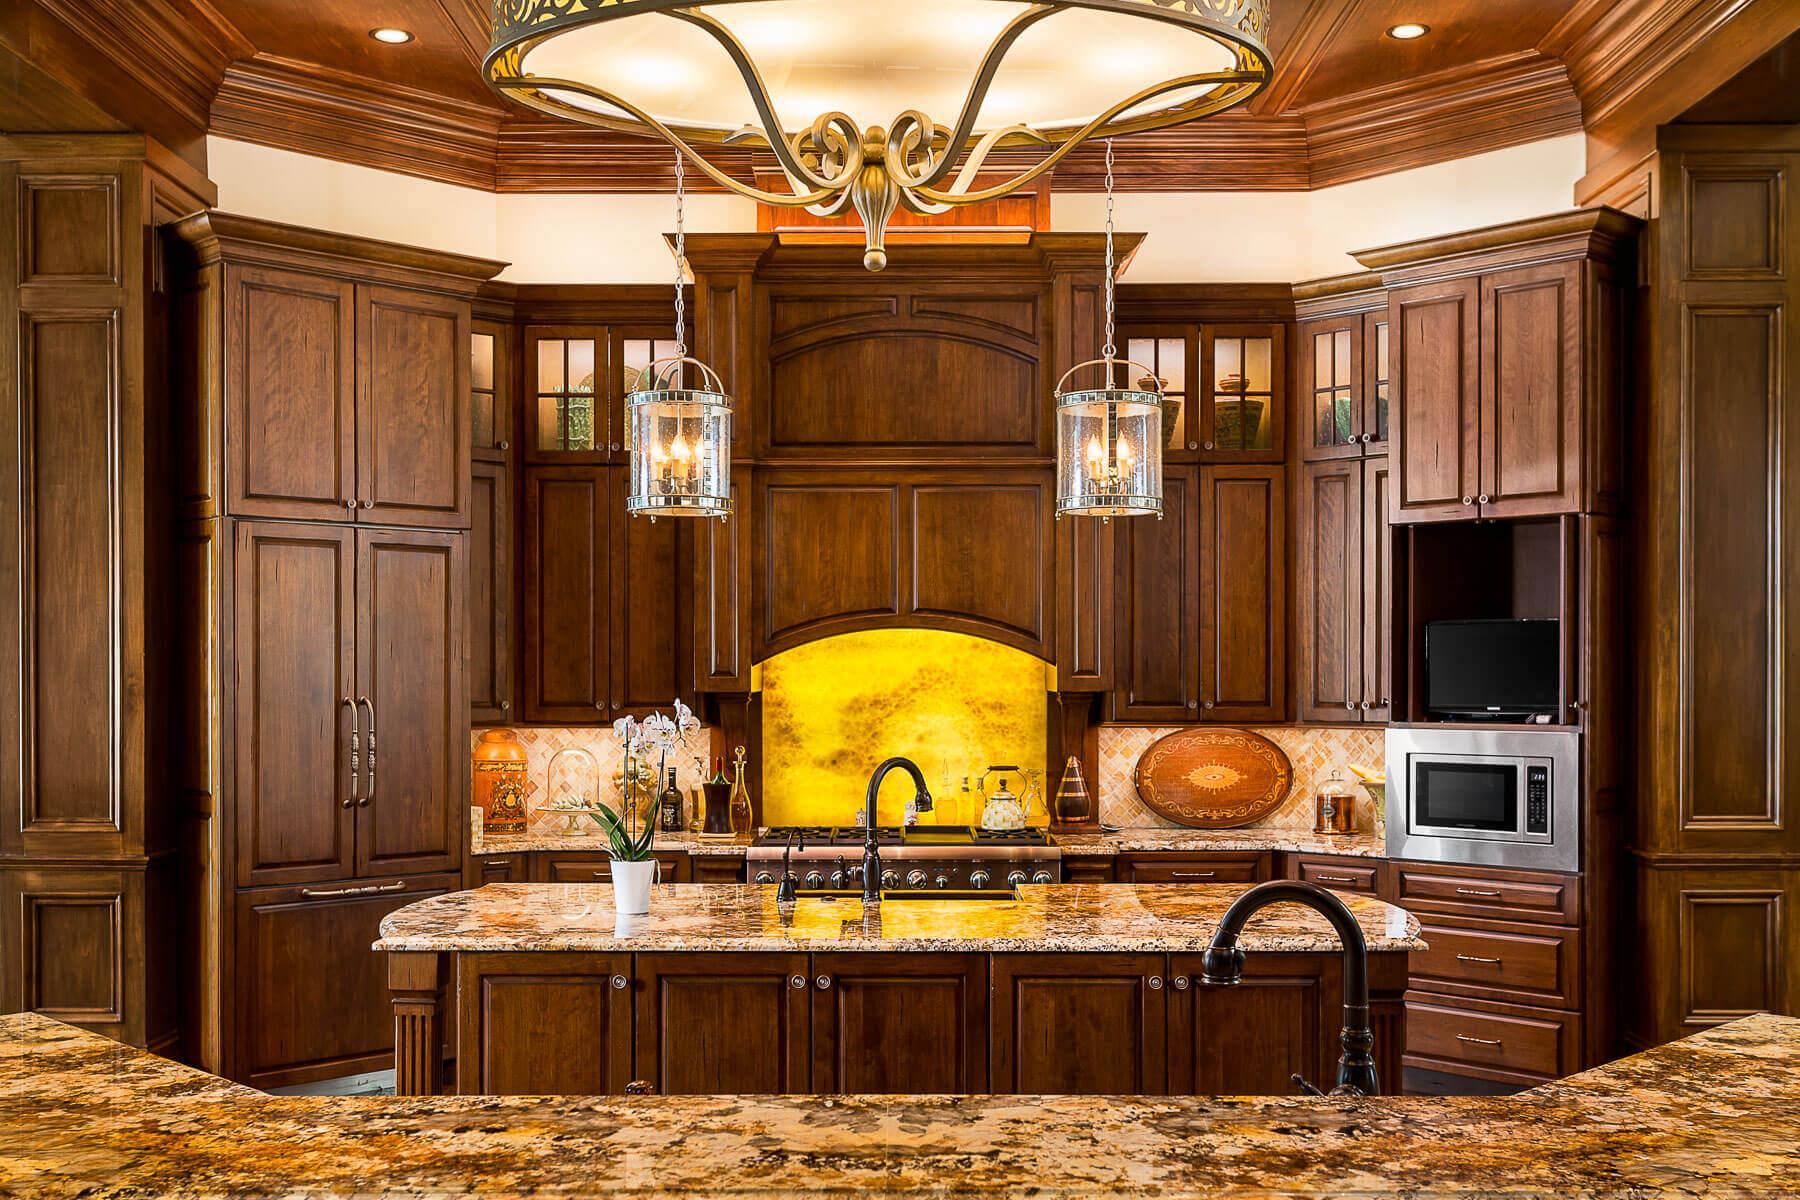 PH_Kitchen-Lighting-Default-Coats-Residence